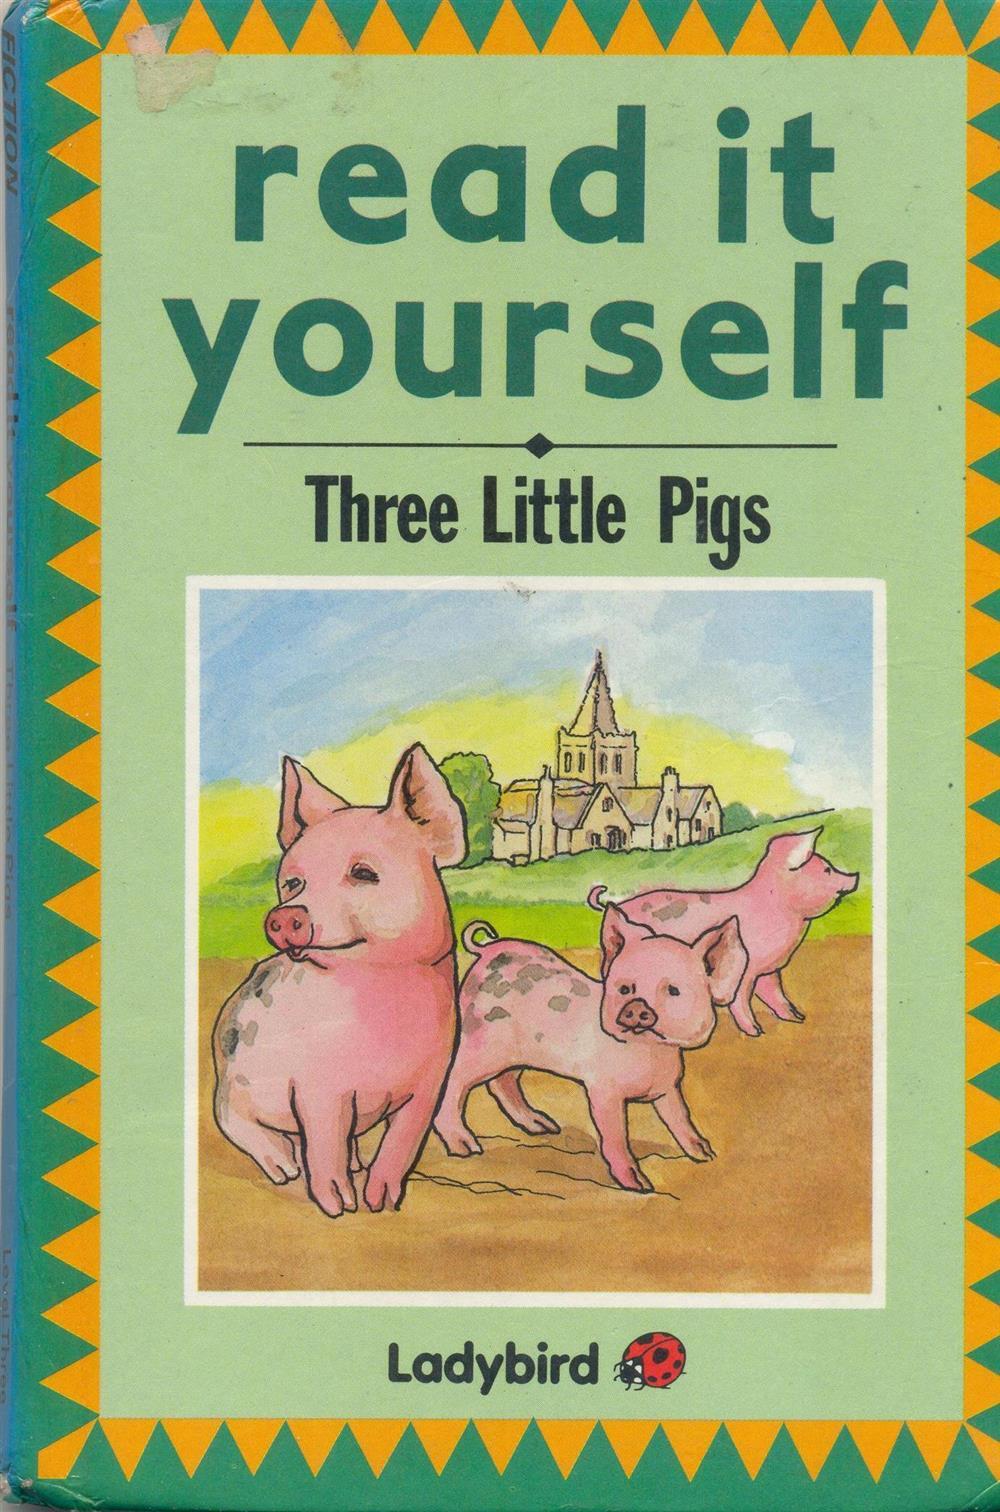 three little pigs 001.jpg